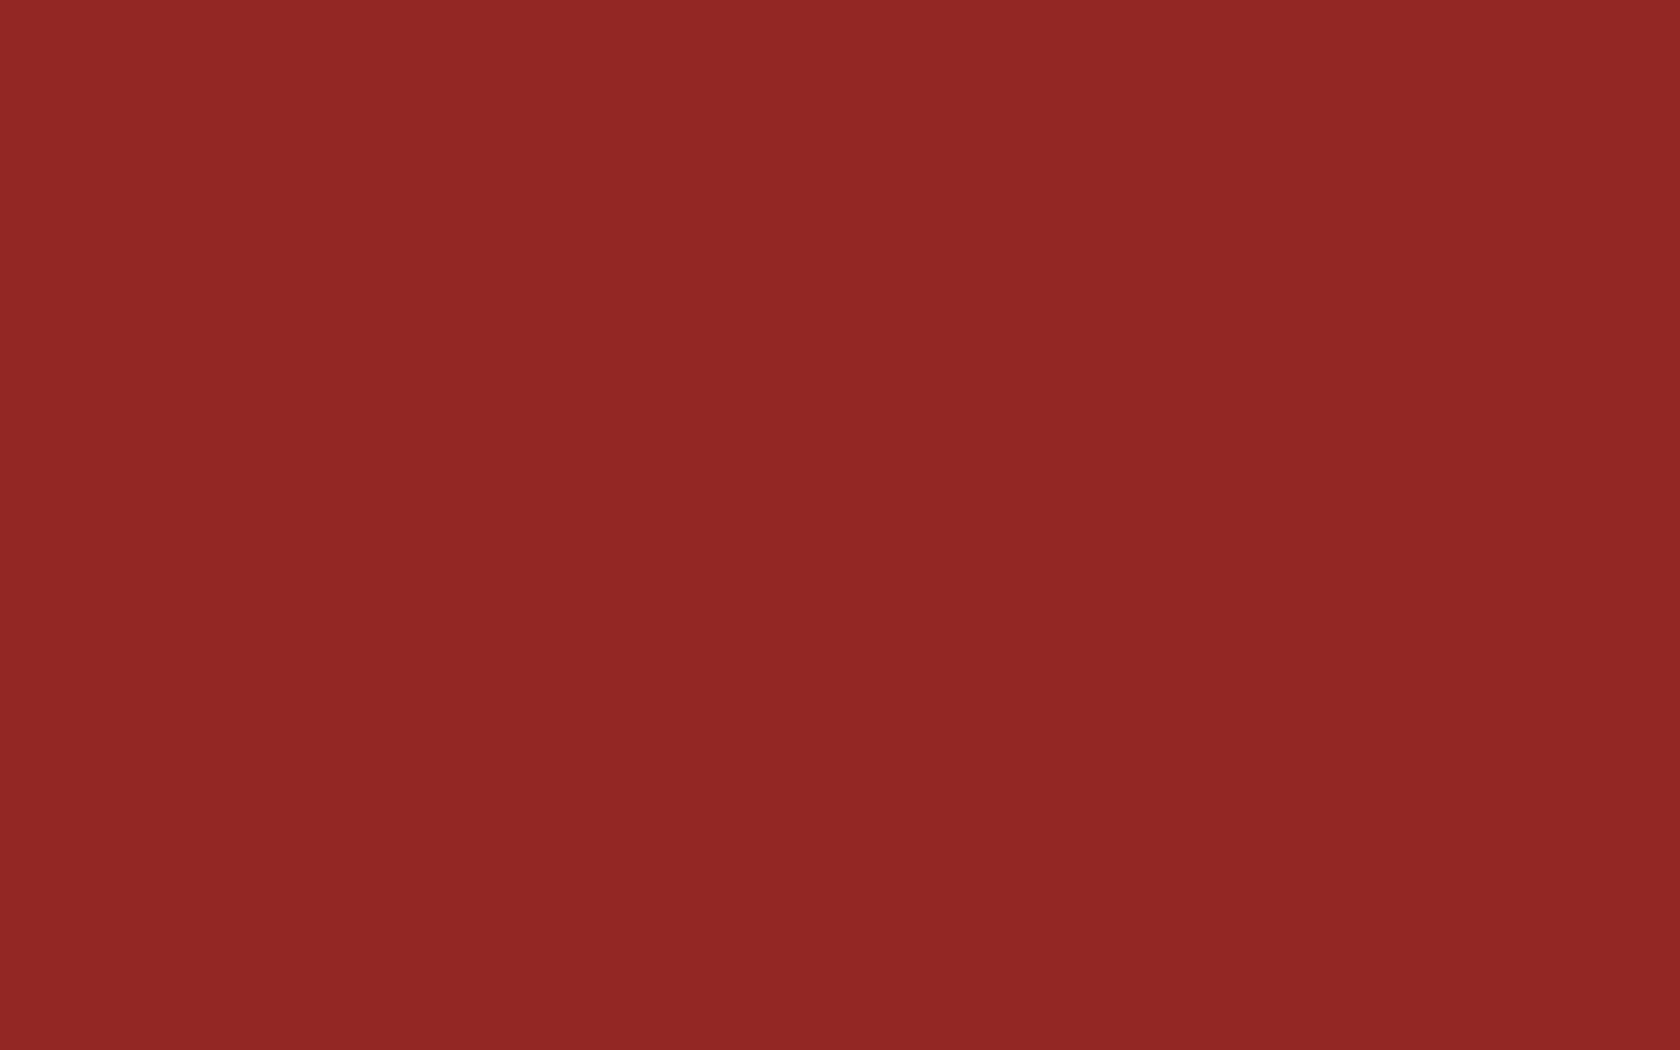 1680x1050 Vivid Auburn Solid Color Background